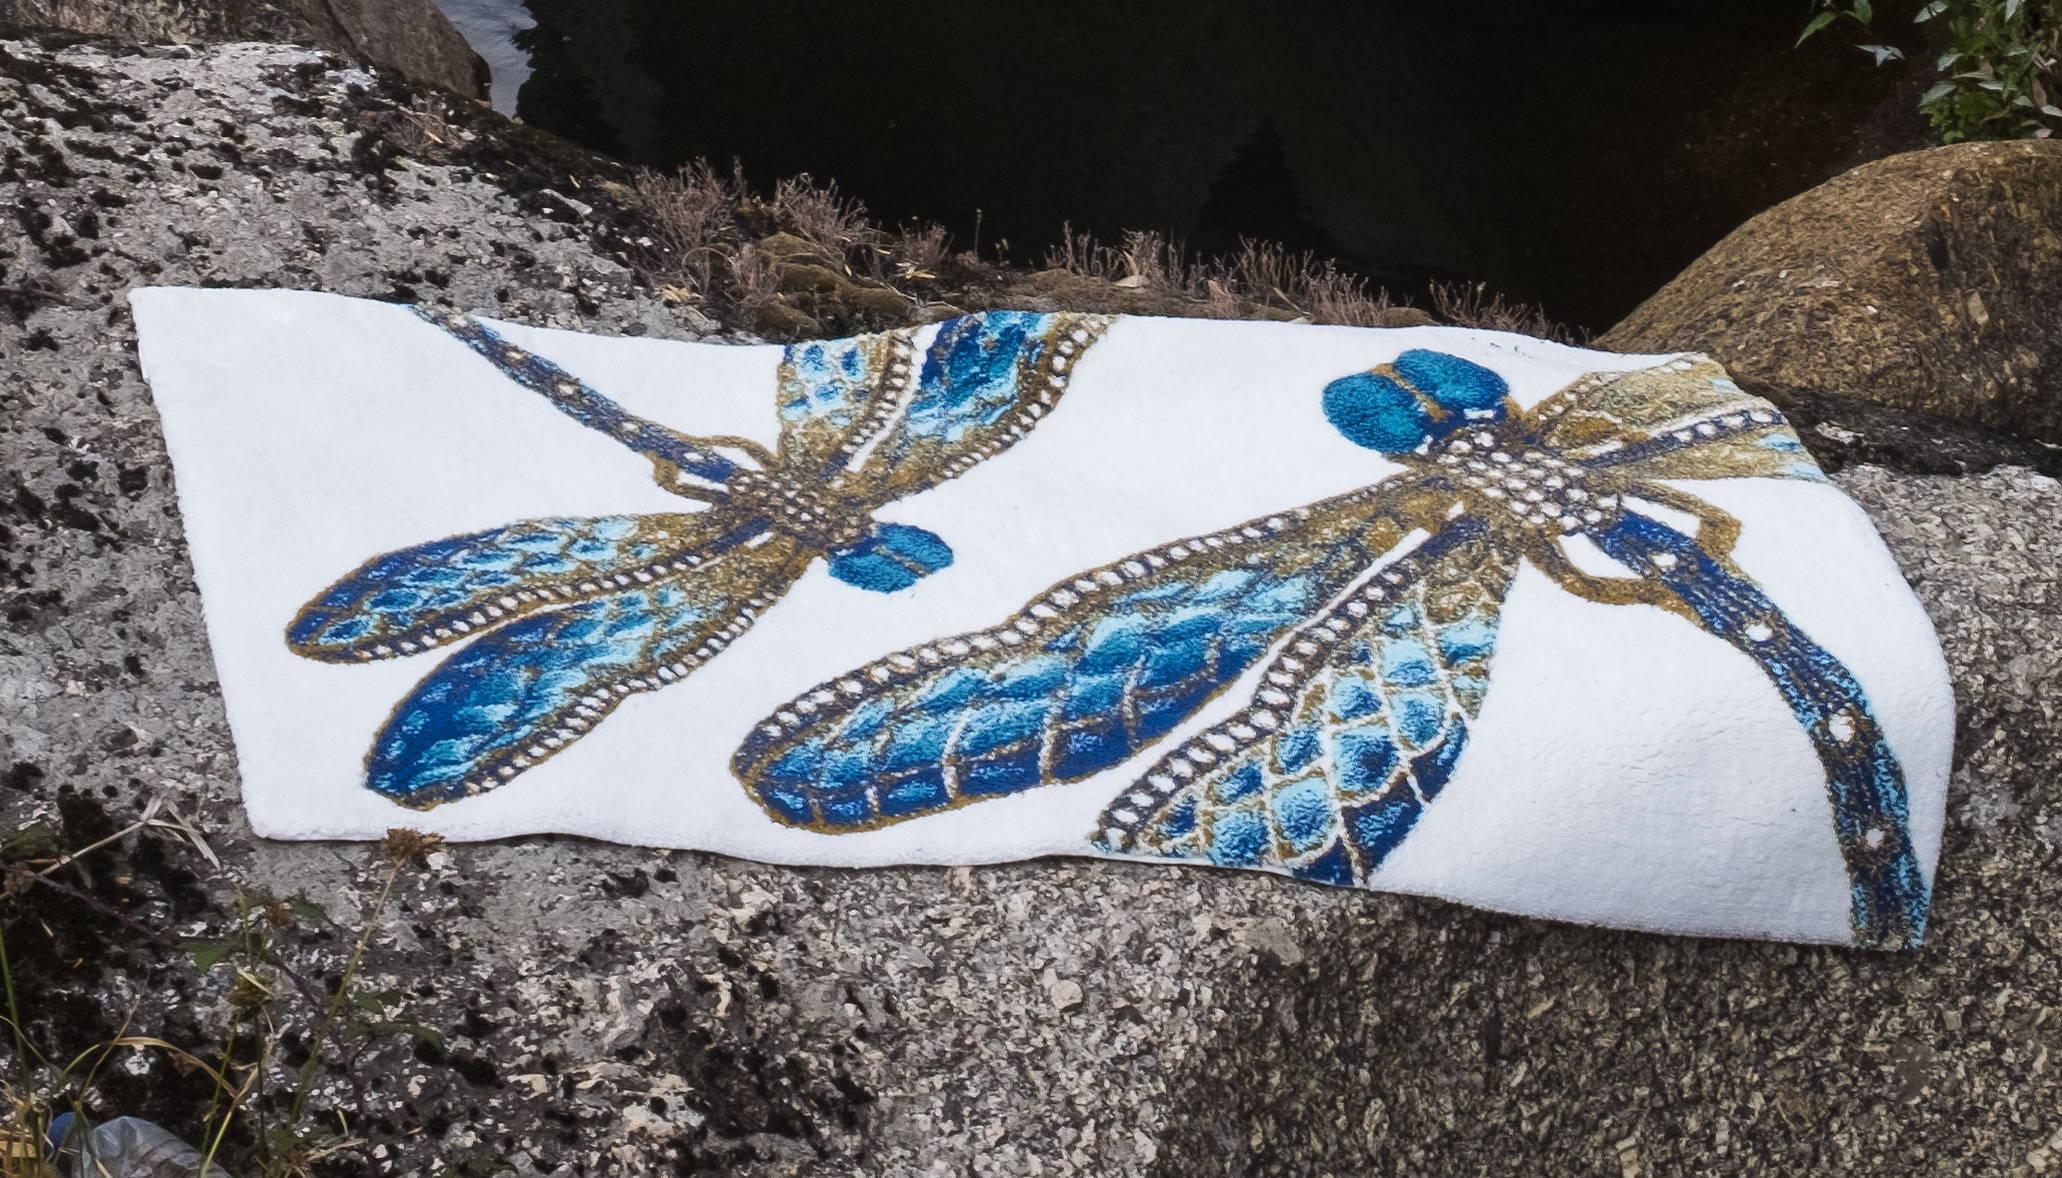 Habidecor Felitsa Dragonfly Bath Rug